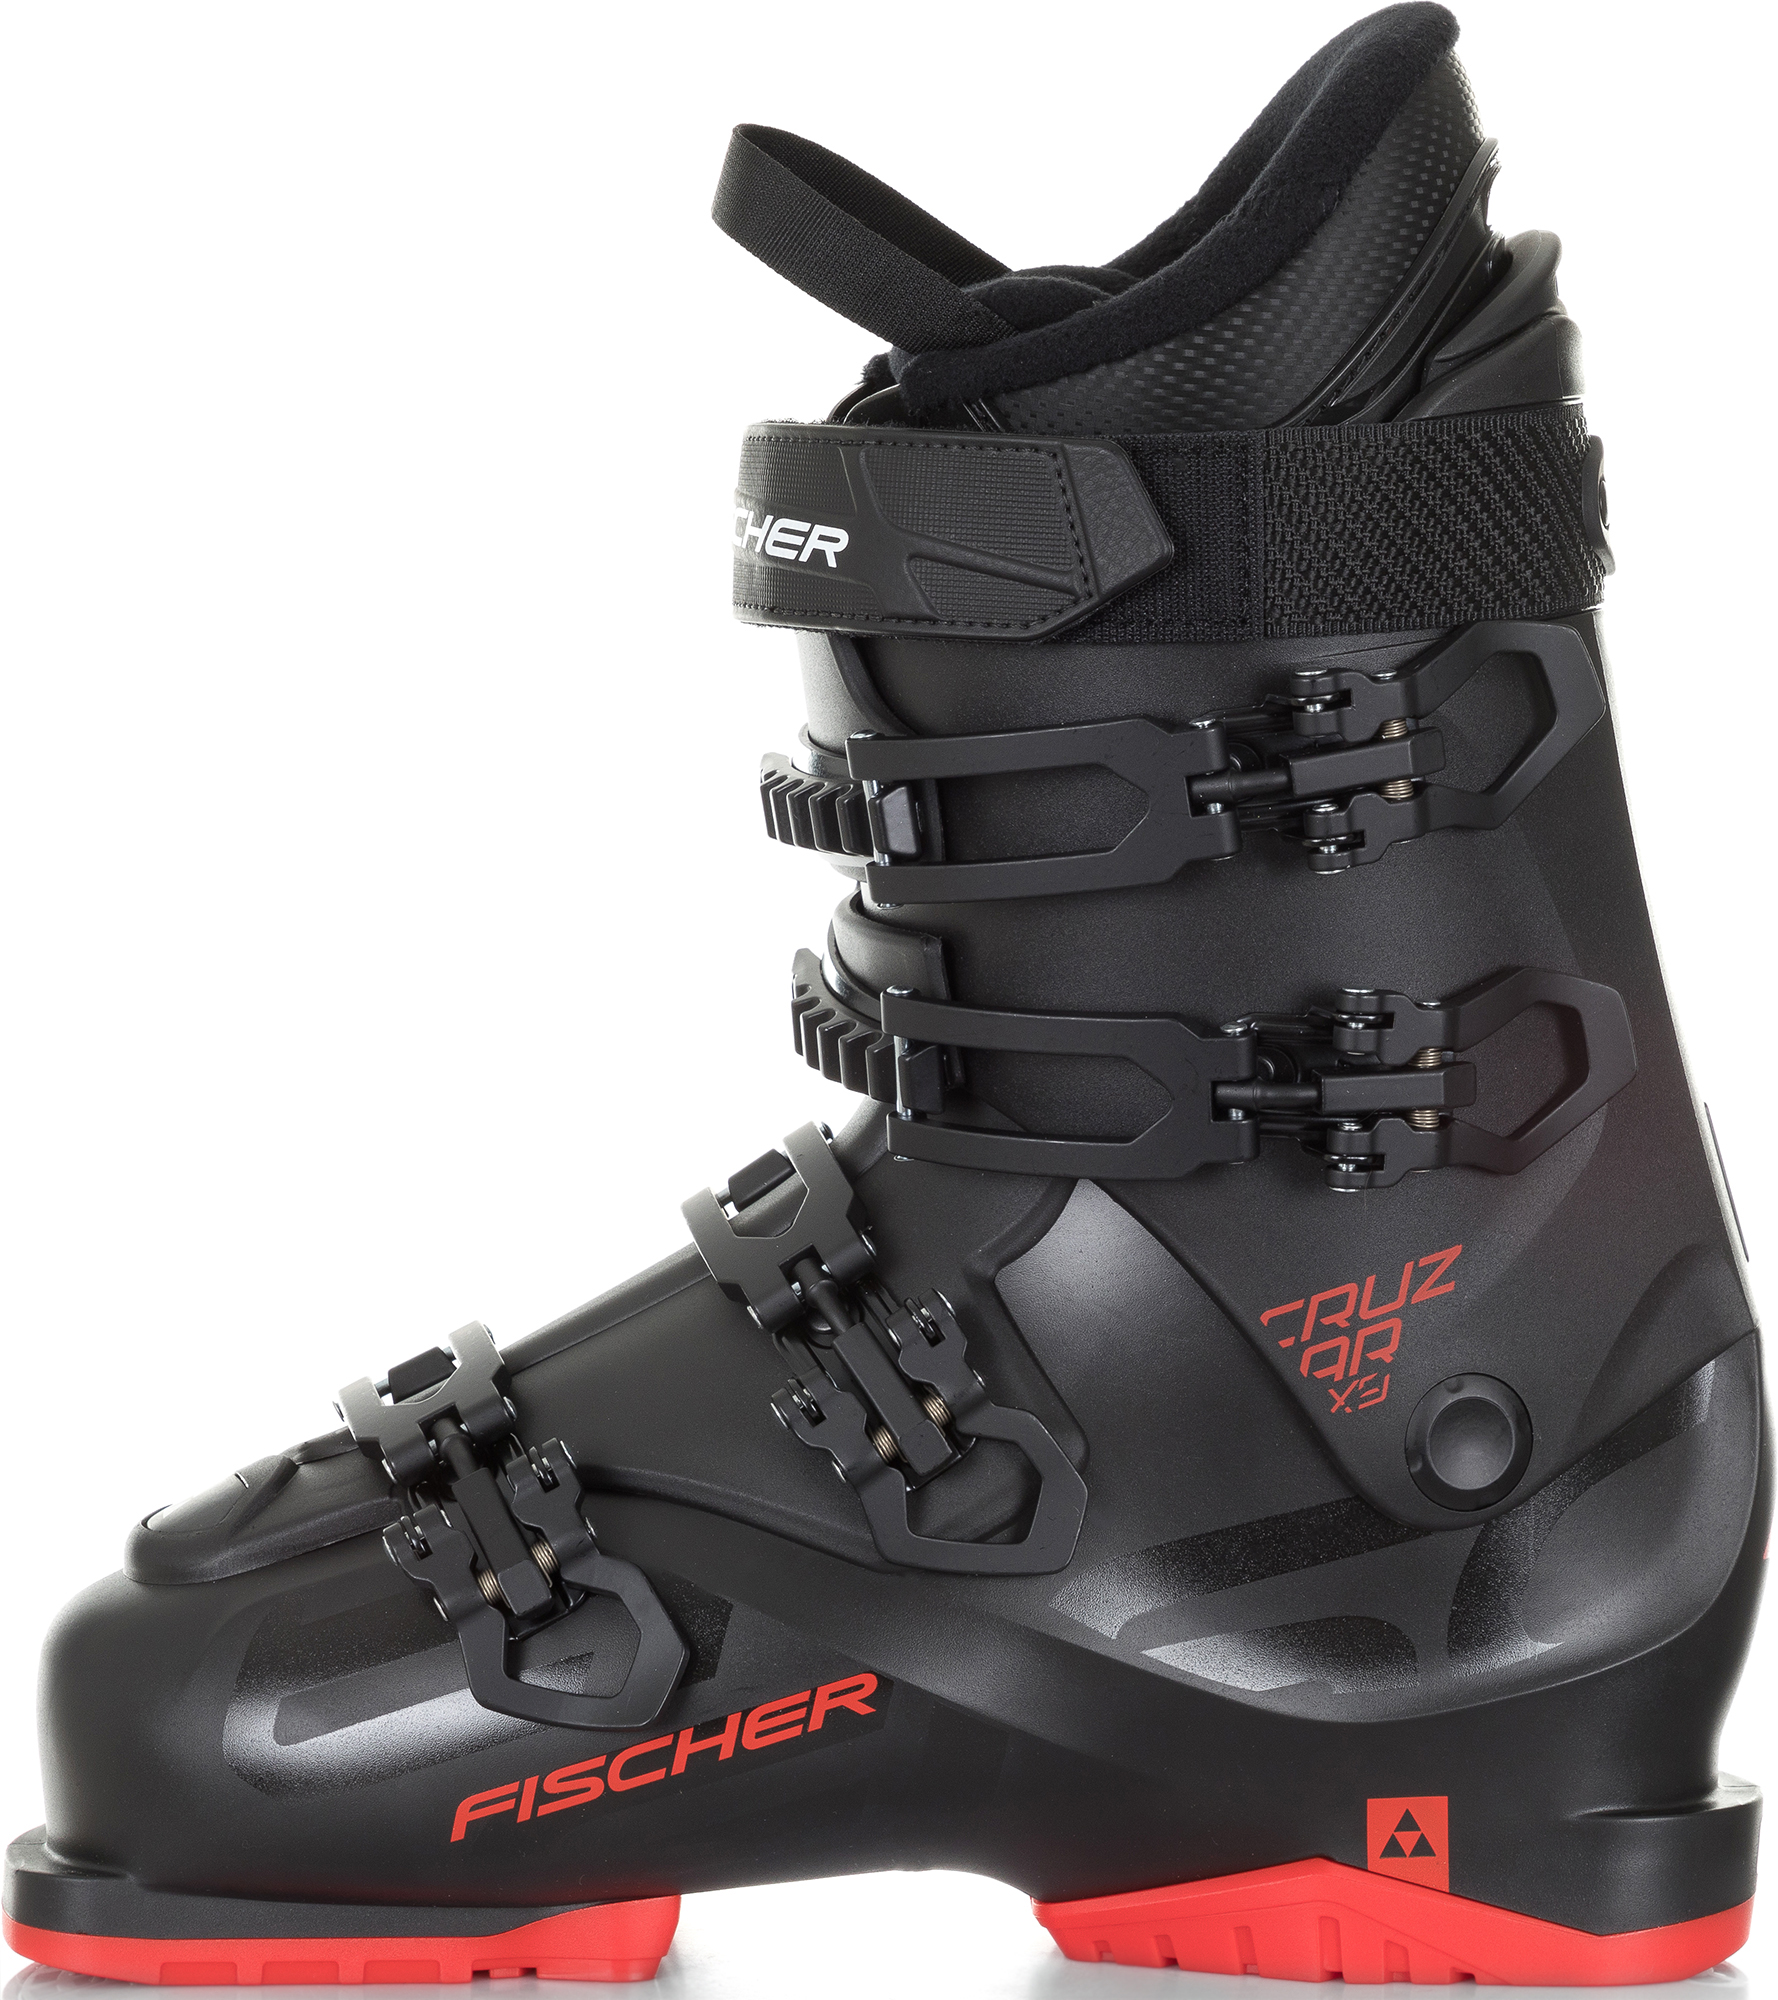 Fischer Ботинки горнолыжные CRUZAR X 9,0 THERMOSHAPE, размер 47.5